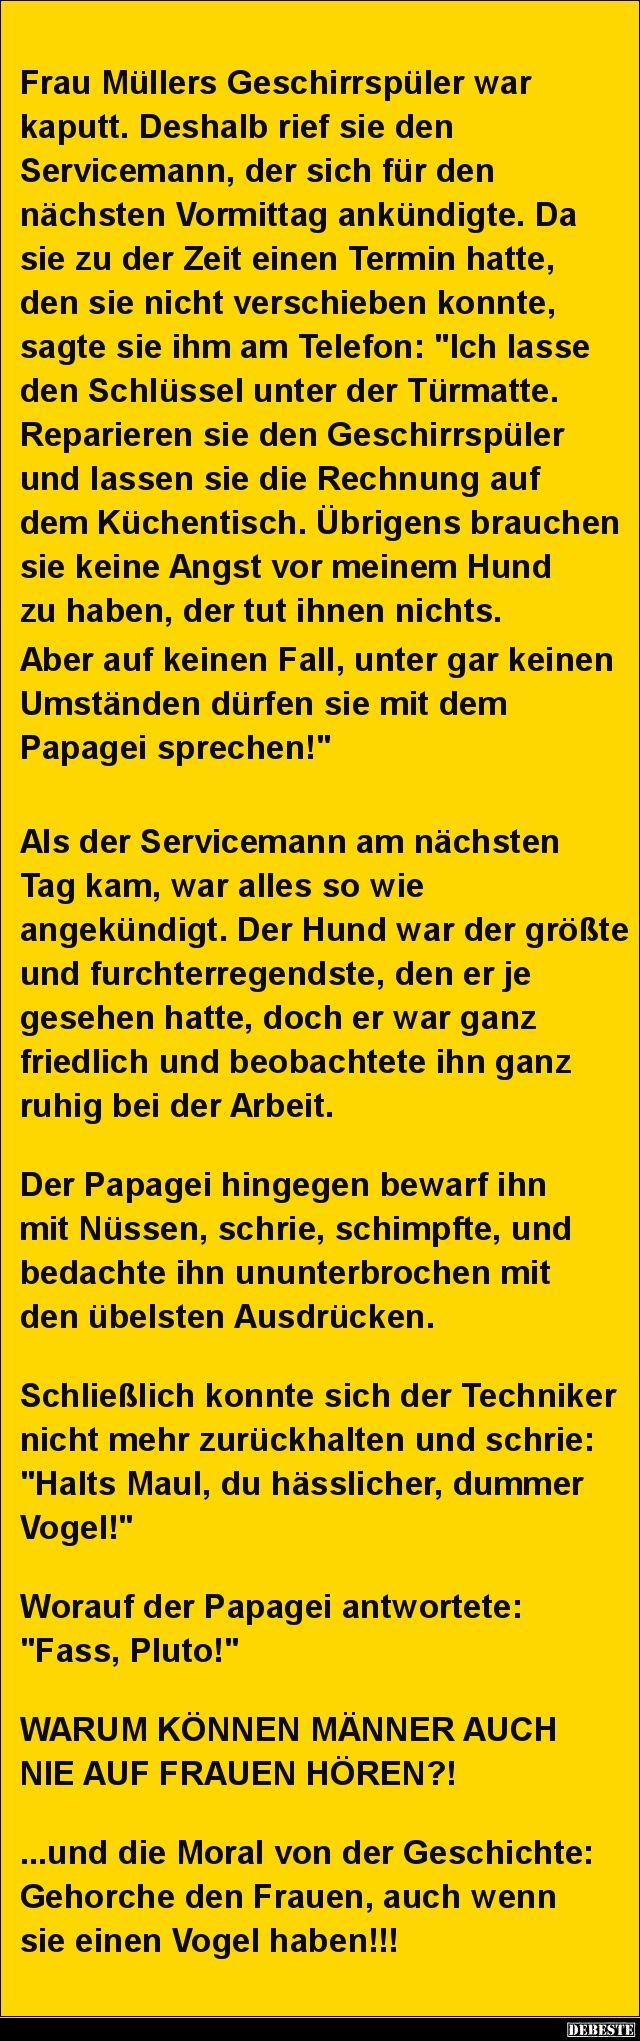 Frau Müllers Geschirrspüler war kaputt.. | Lustige Bilder, Sprüche, Witze, echt lustig